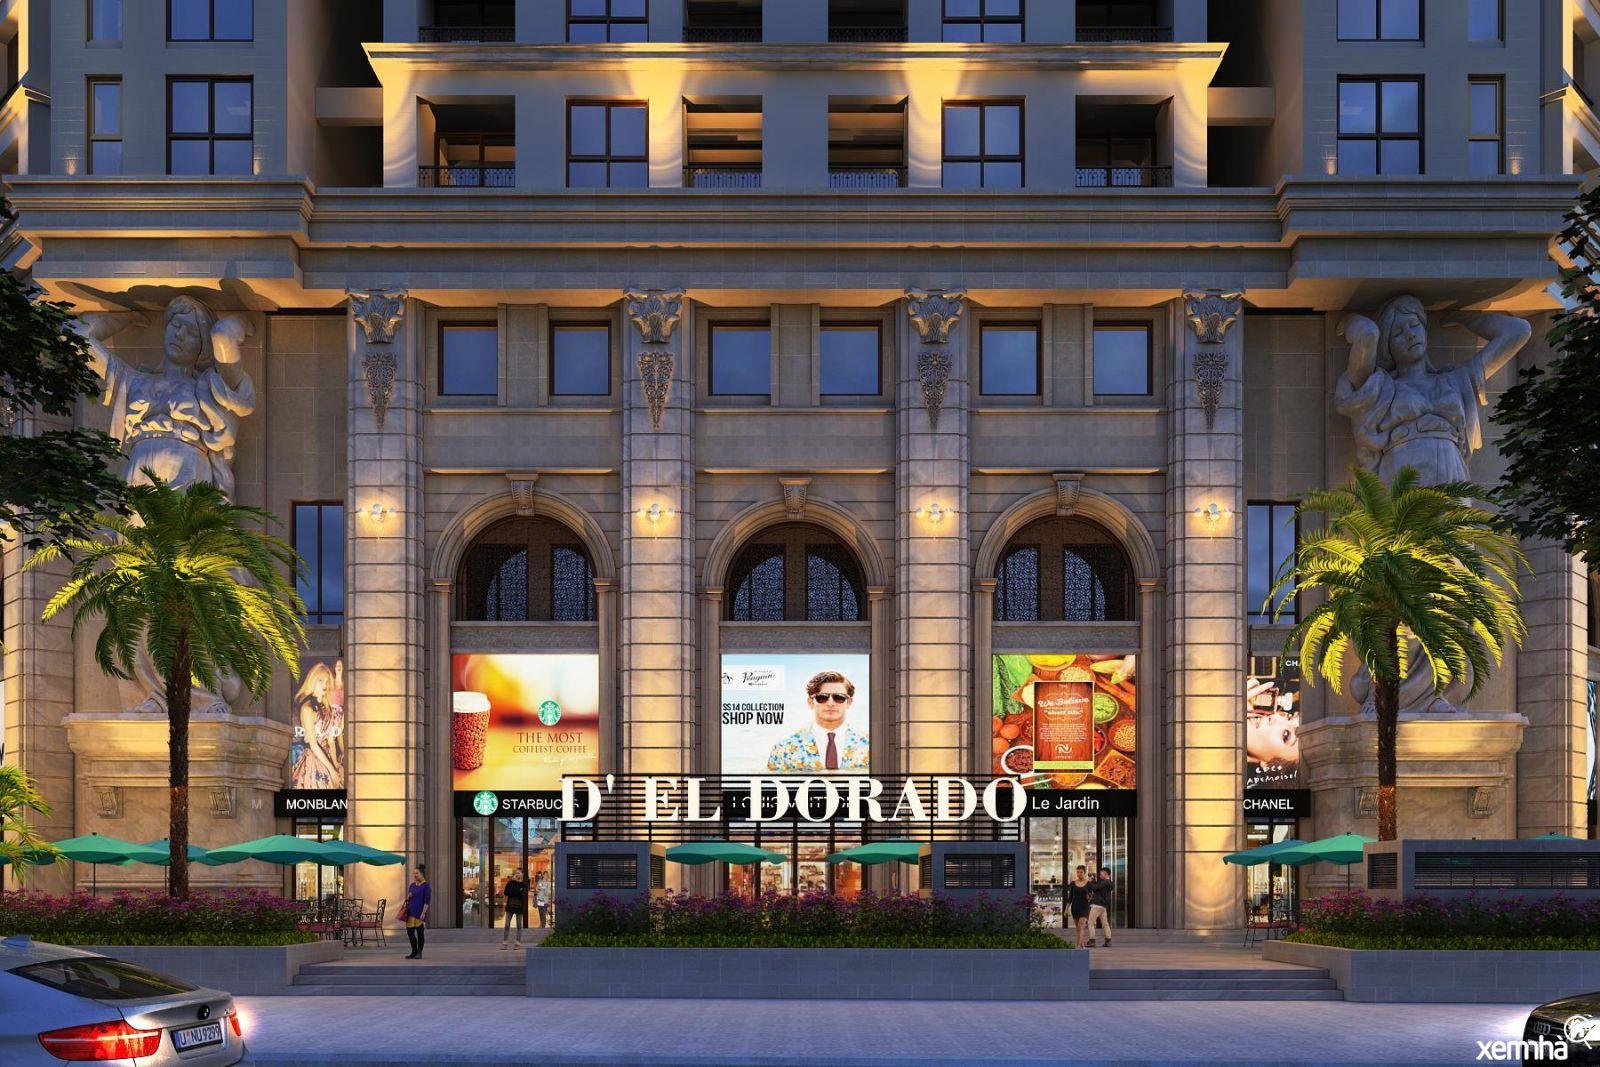 Dự án chung cư D'El Dorado Tây Hồ